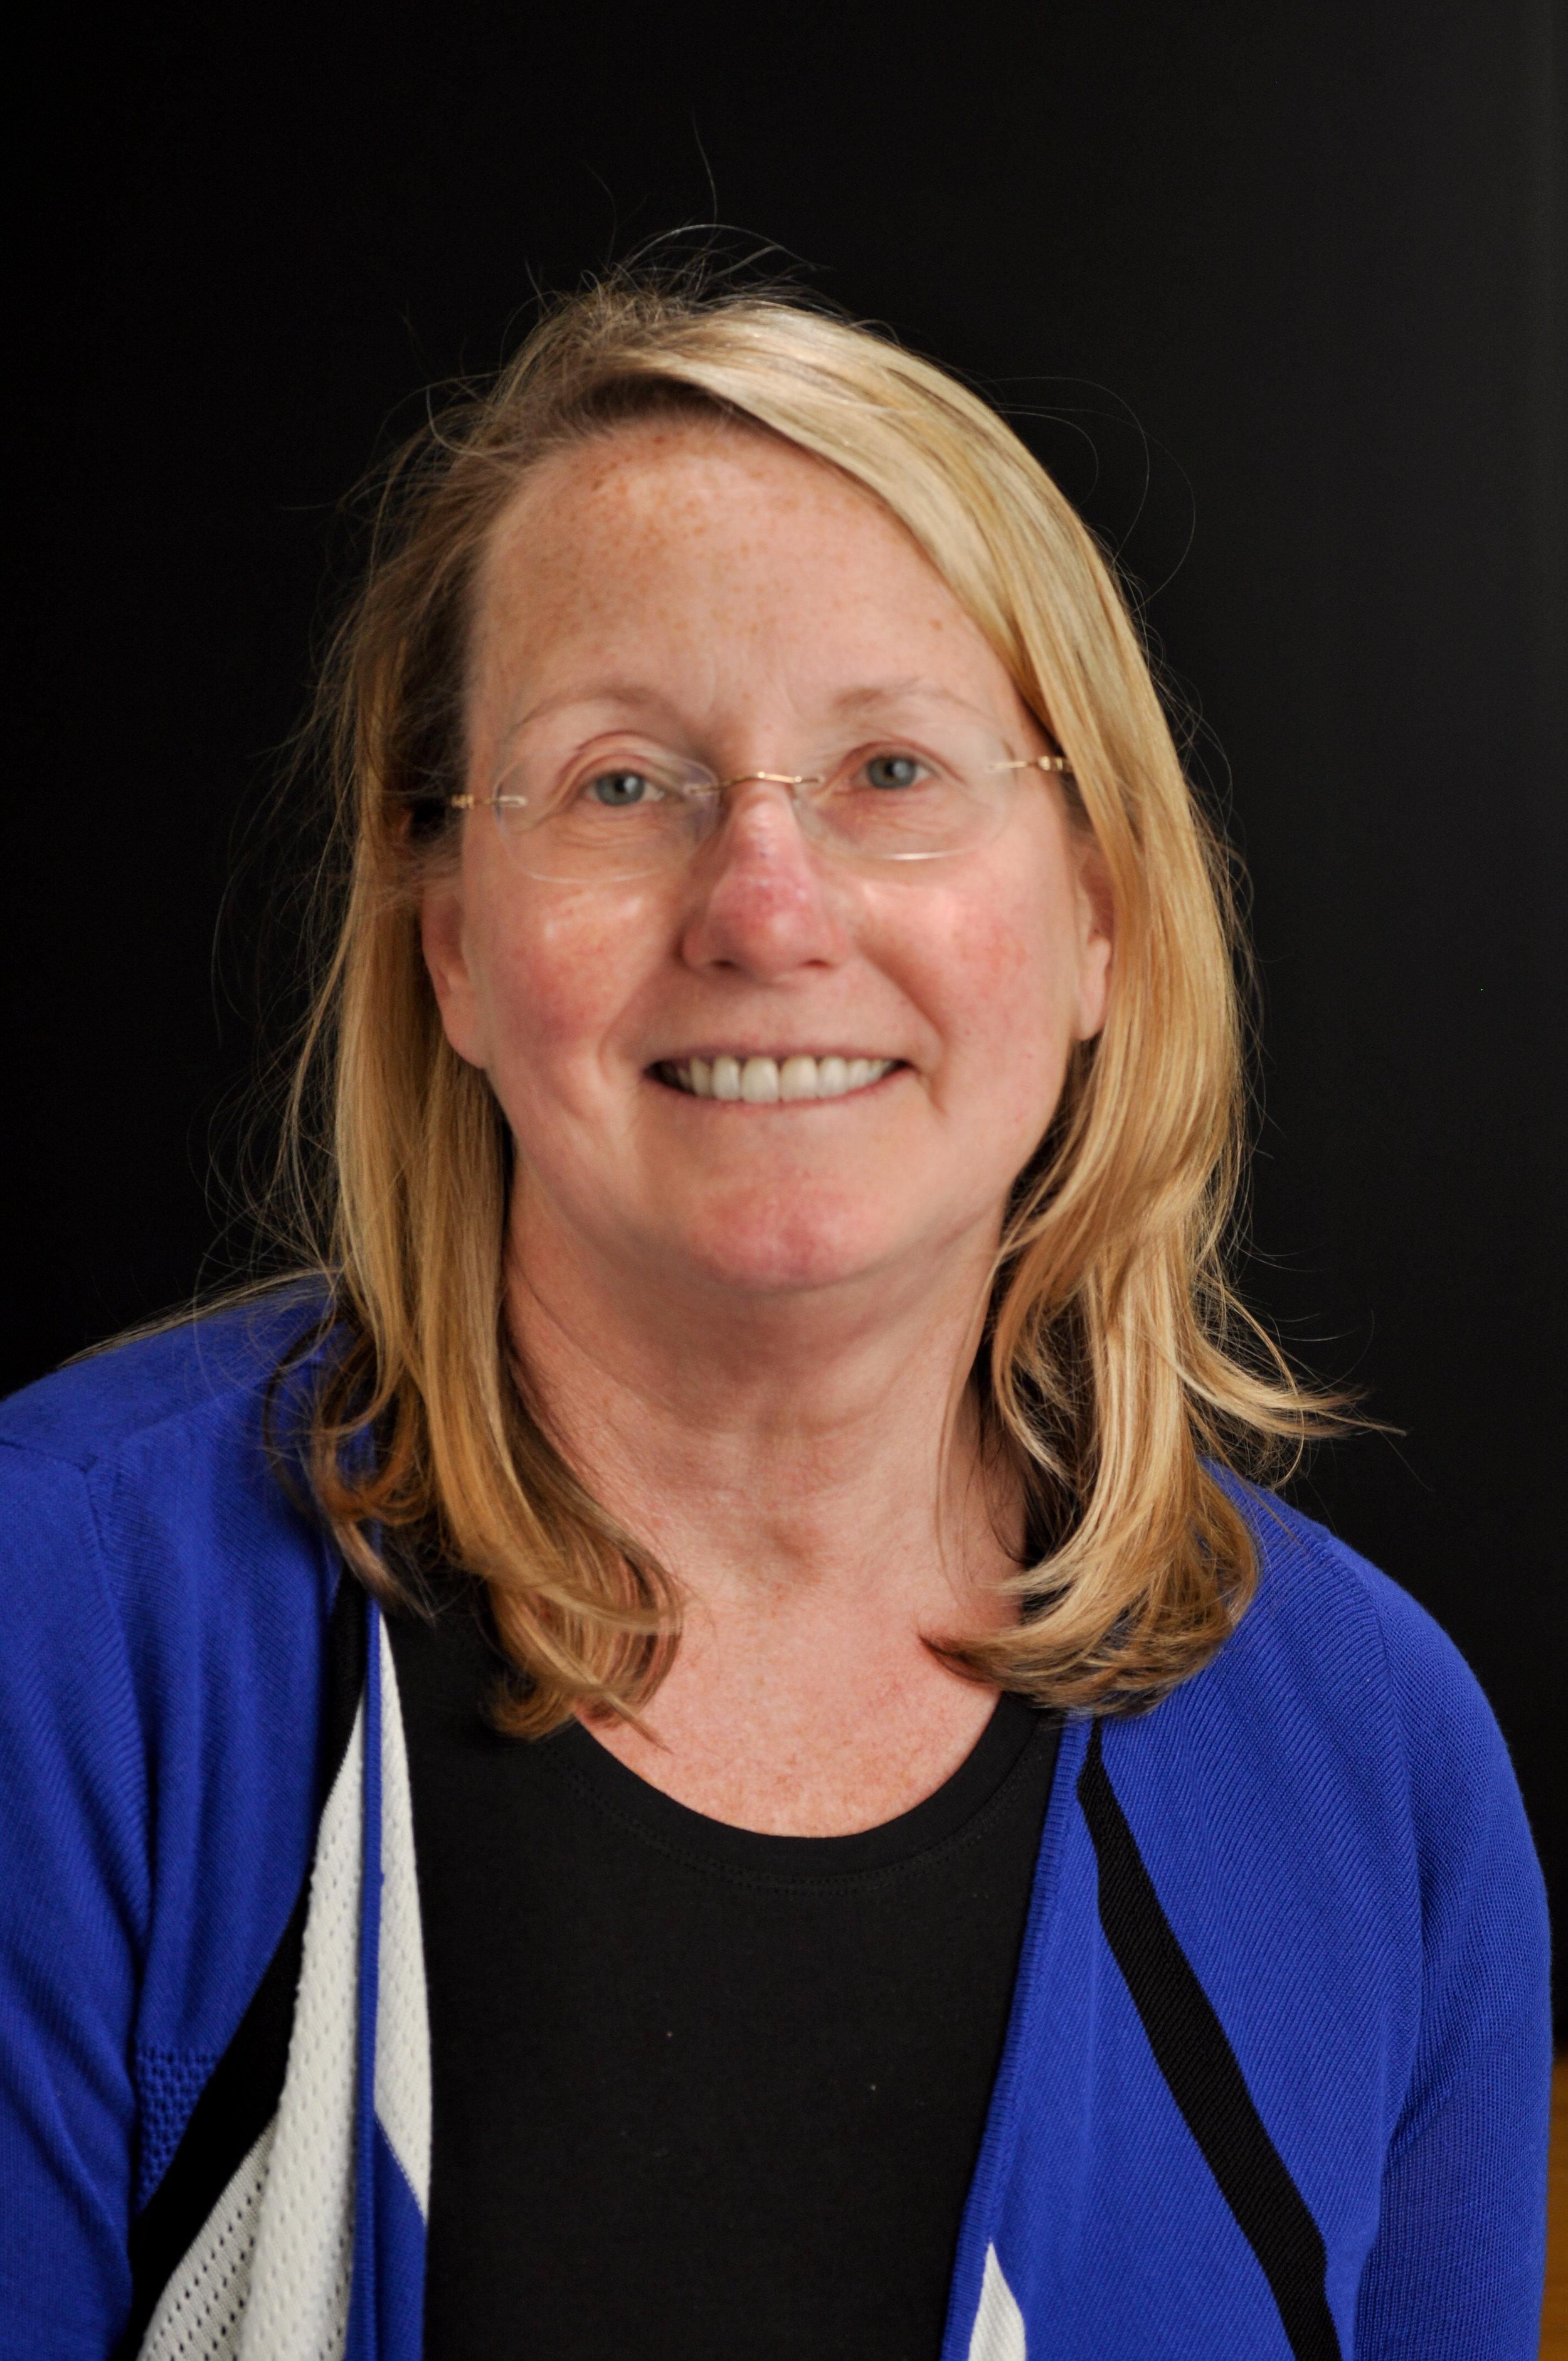 Kathy - Administrator